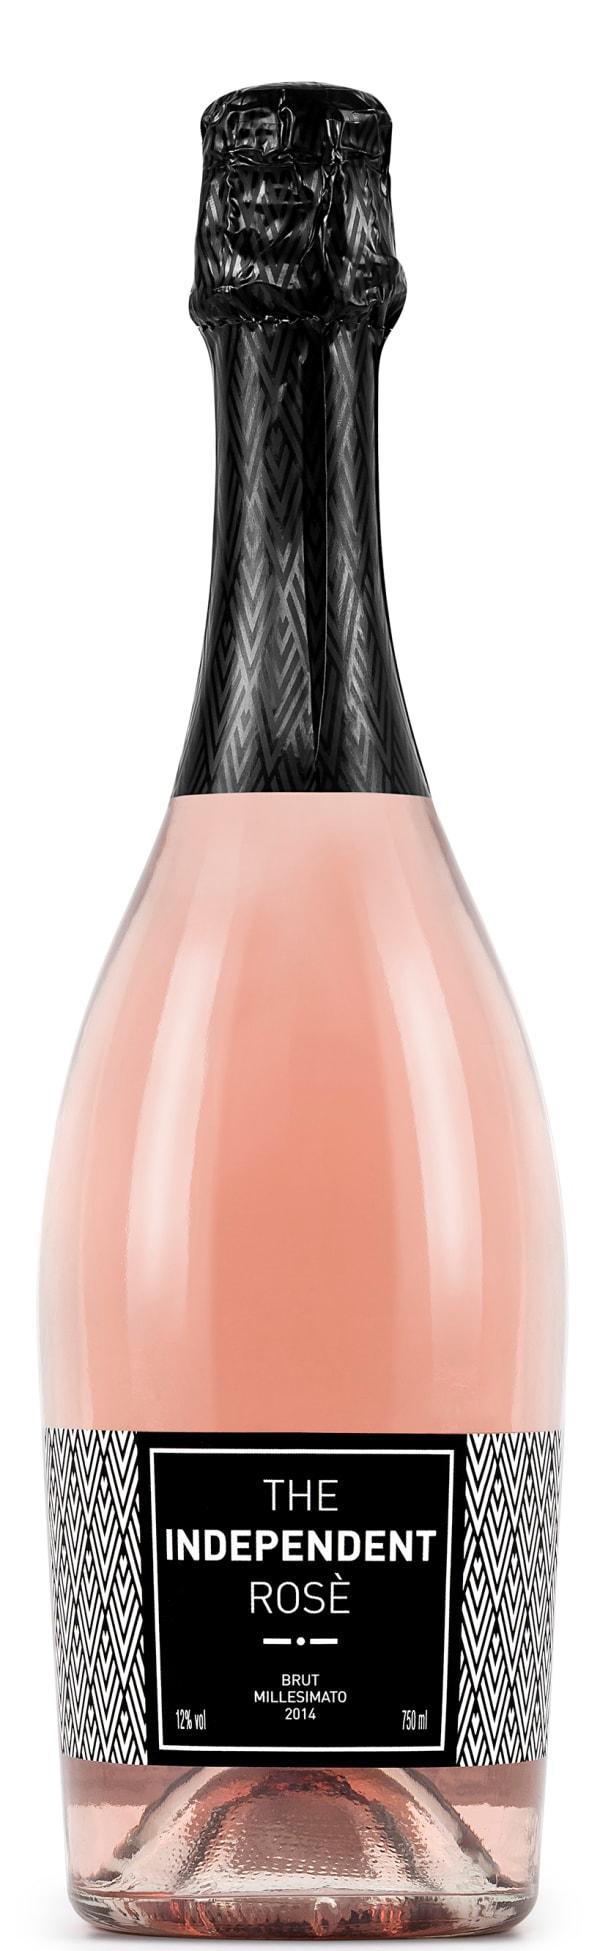 The Independent Rosé Brut 2014